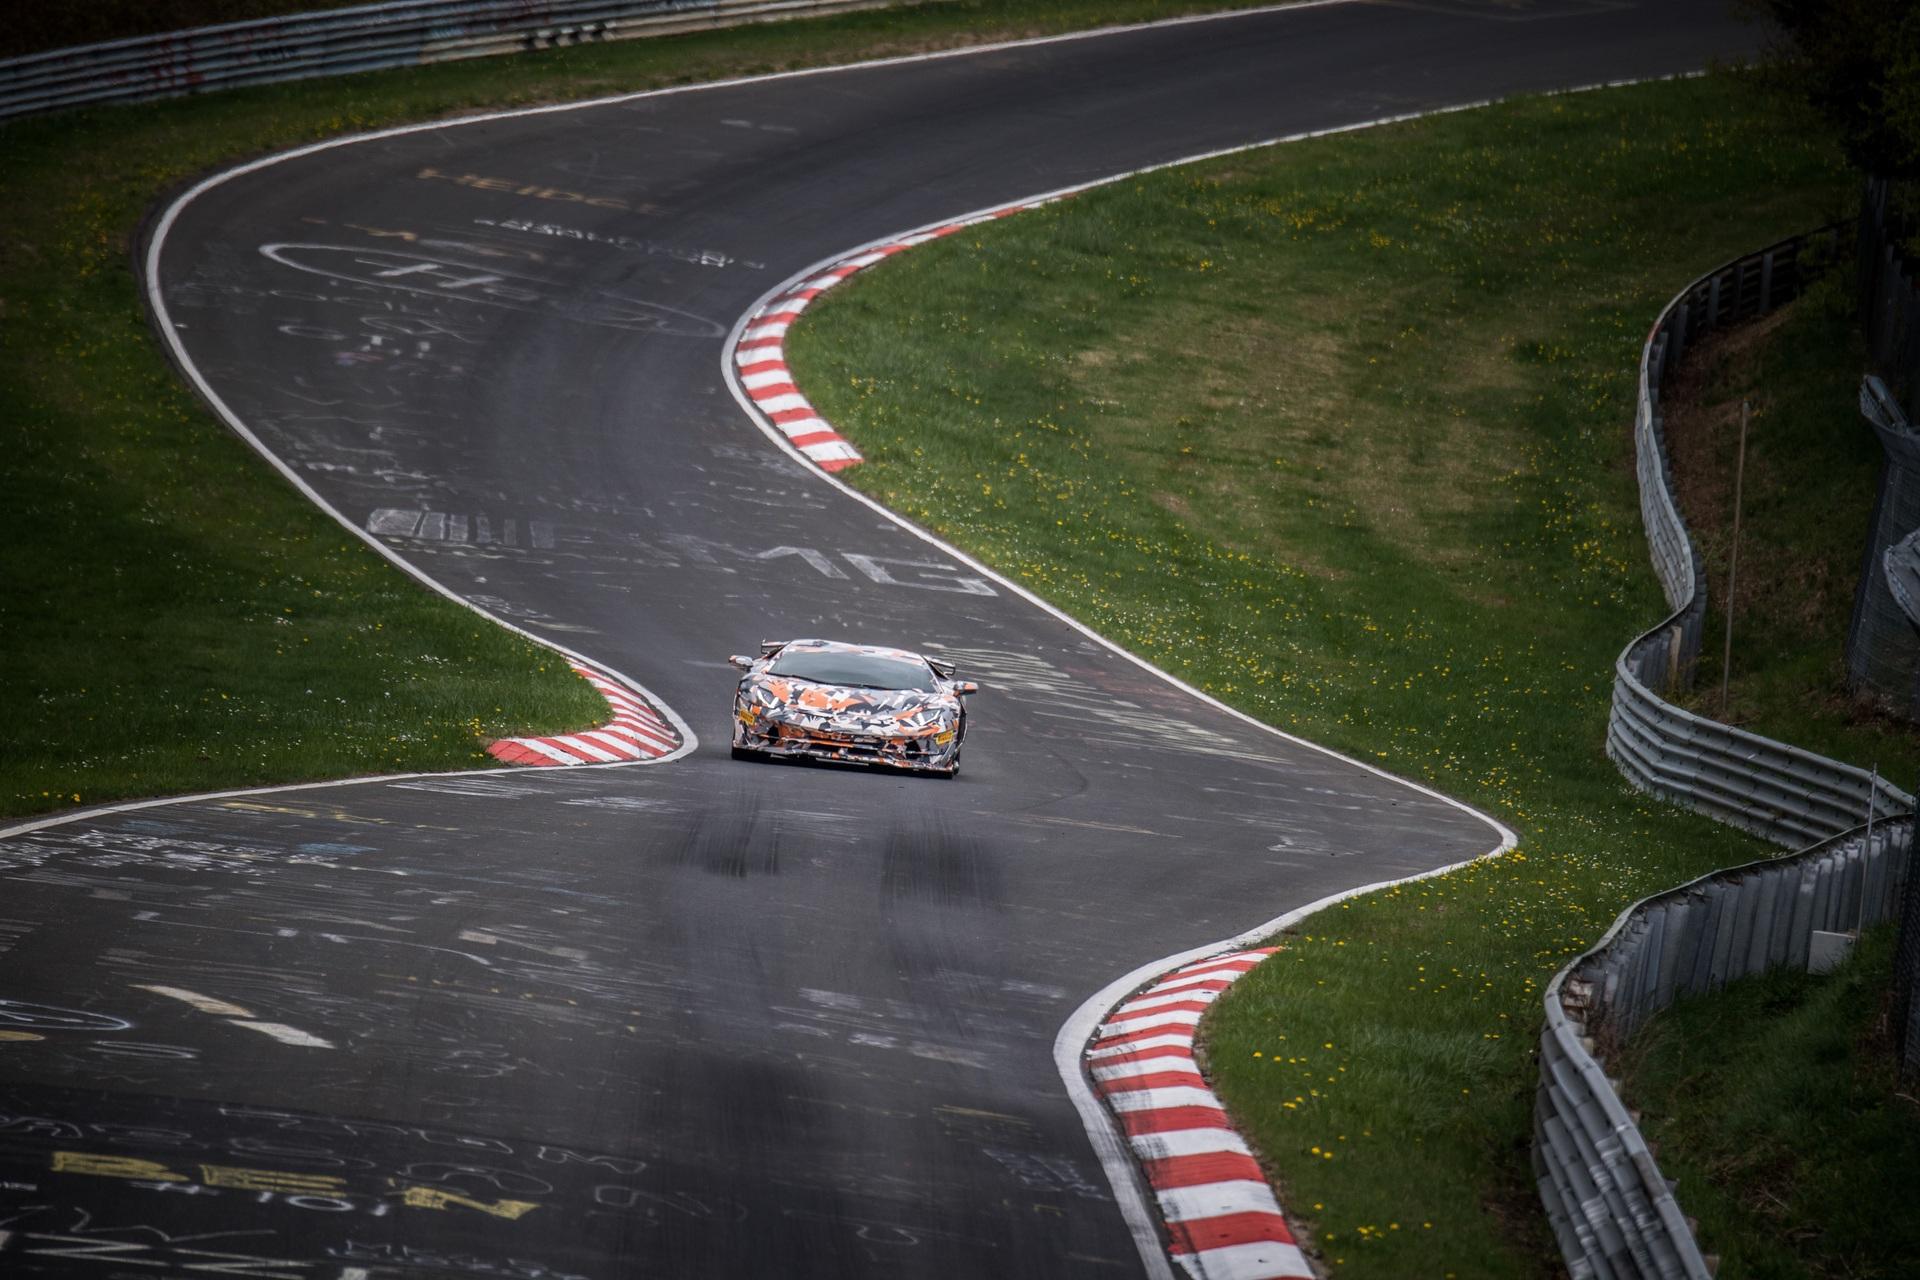 Lamborghini_Aventador_SVJ_Nurburgring_0005